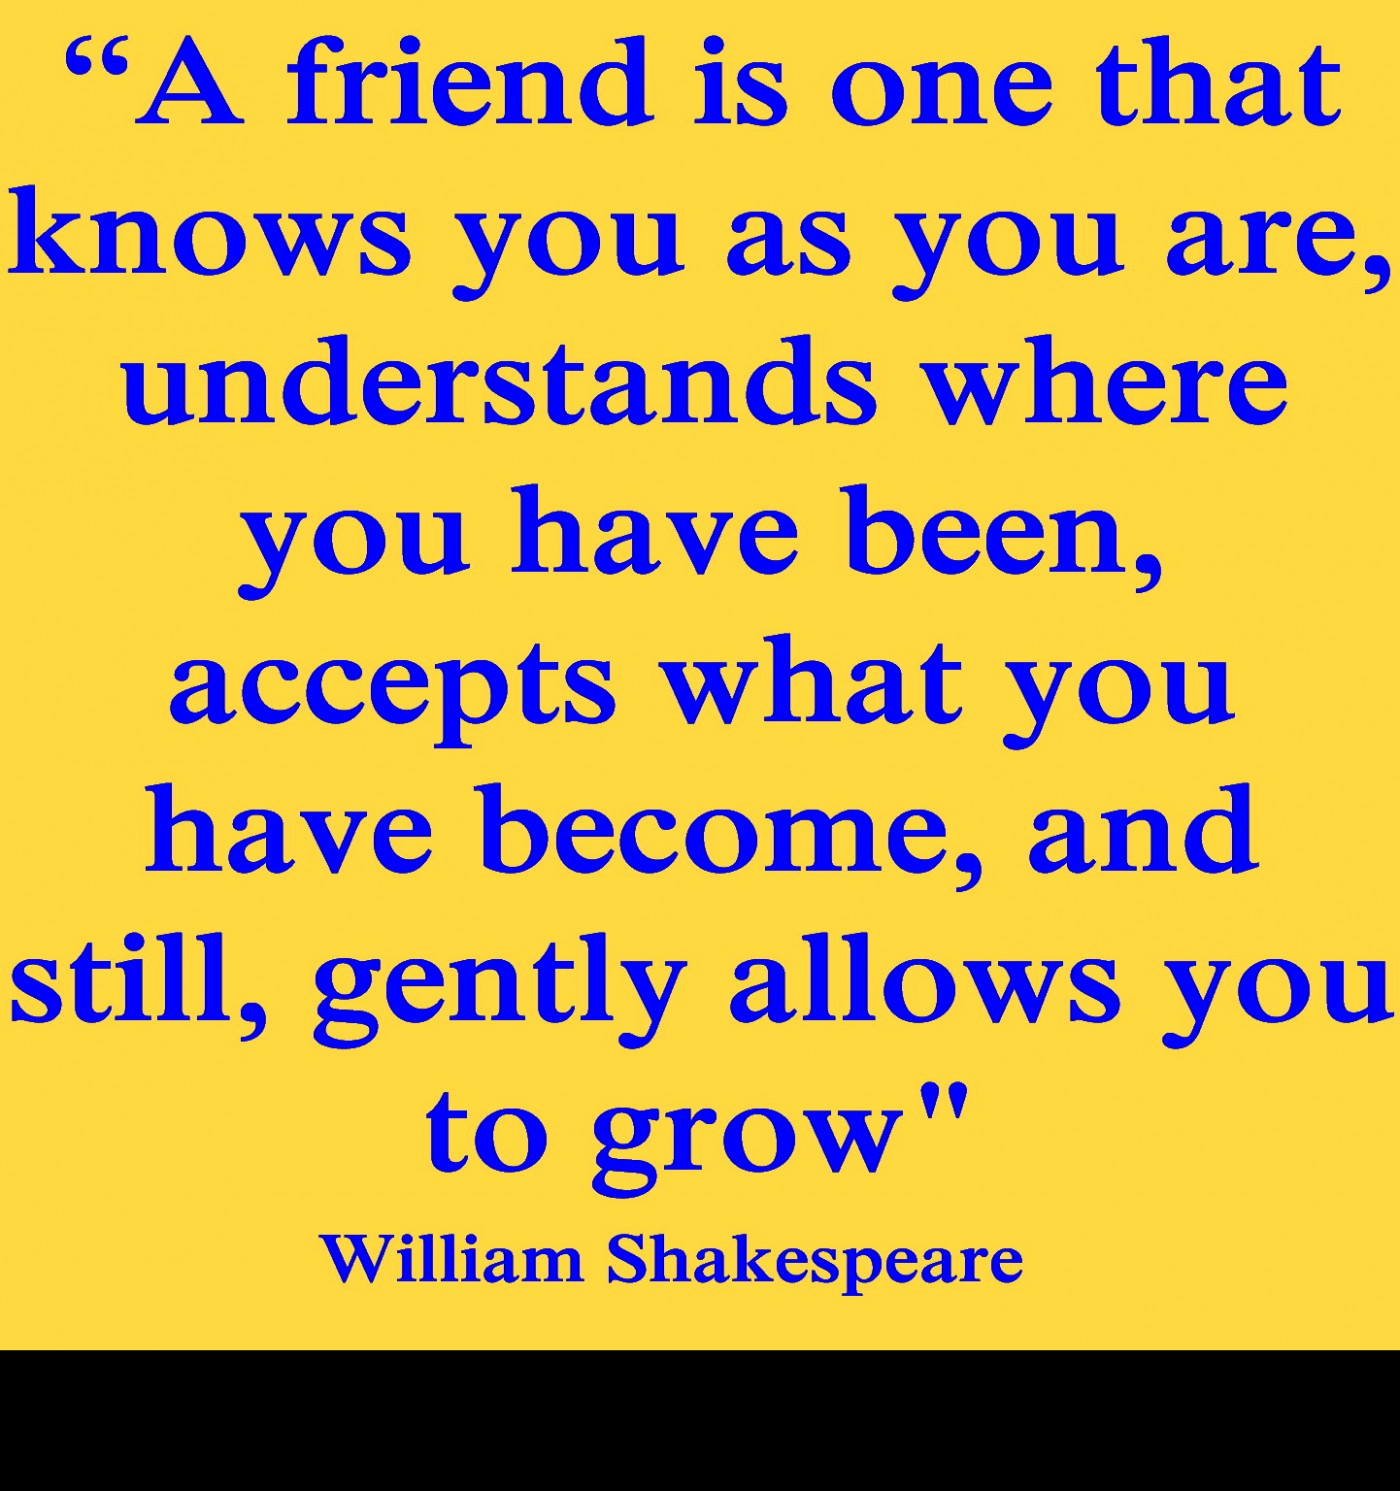 002 Qualities Of Good Friends Essay Lqs178 Amazing A Friend In Hindi Short 1400